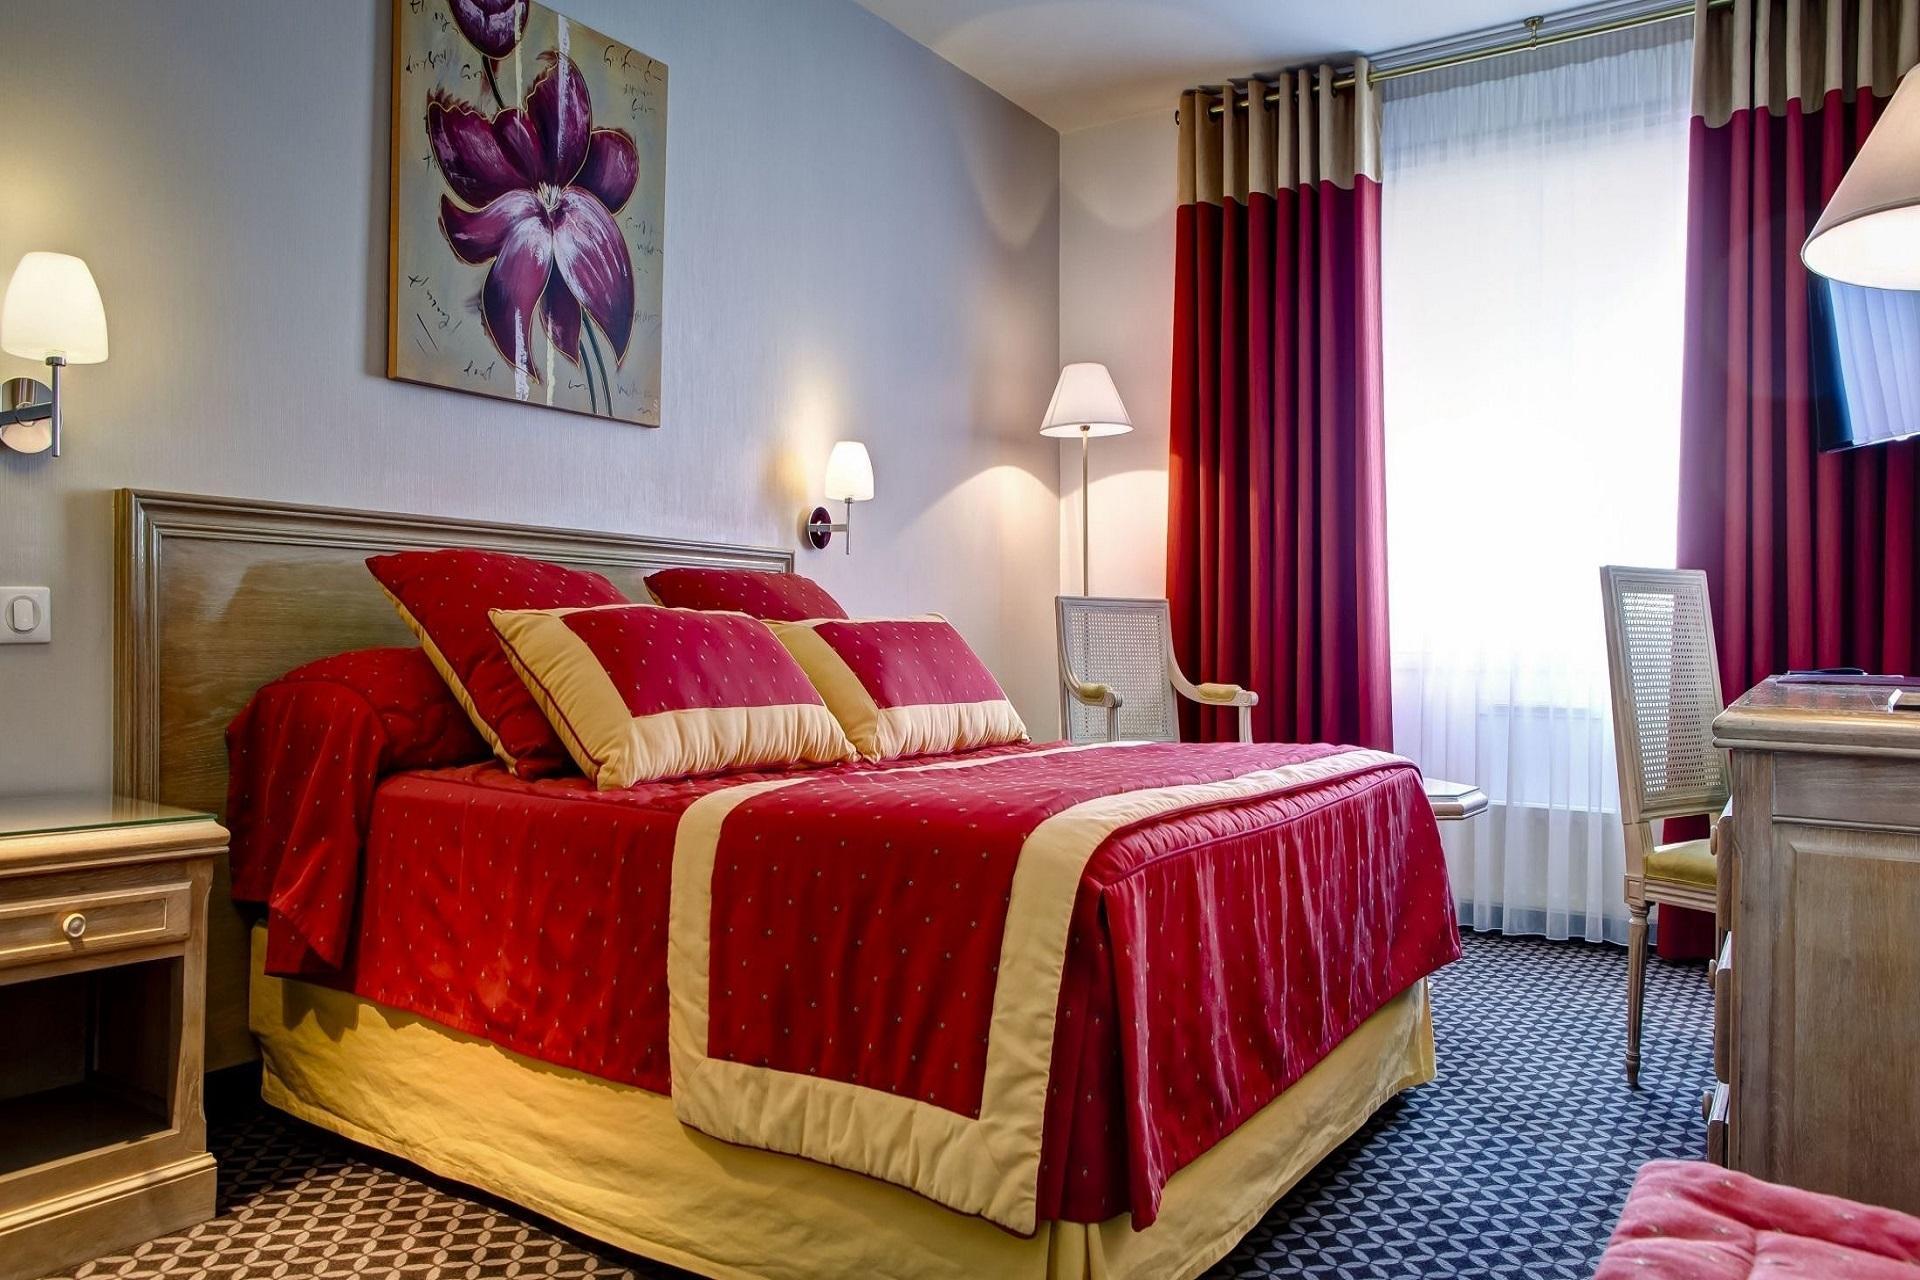 hotel-axotel-Happy-culture-lyon-perrache-hebergement